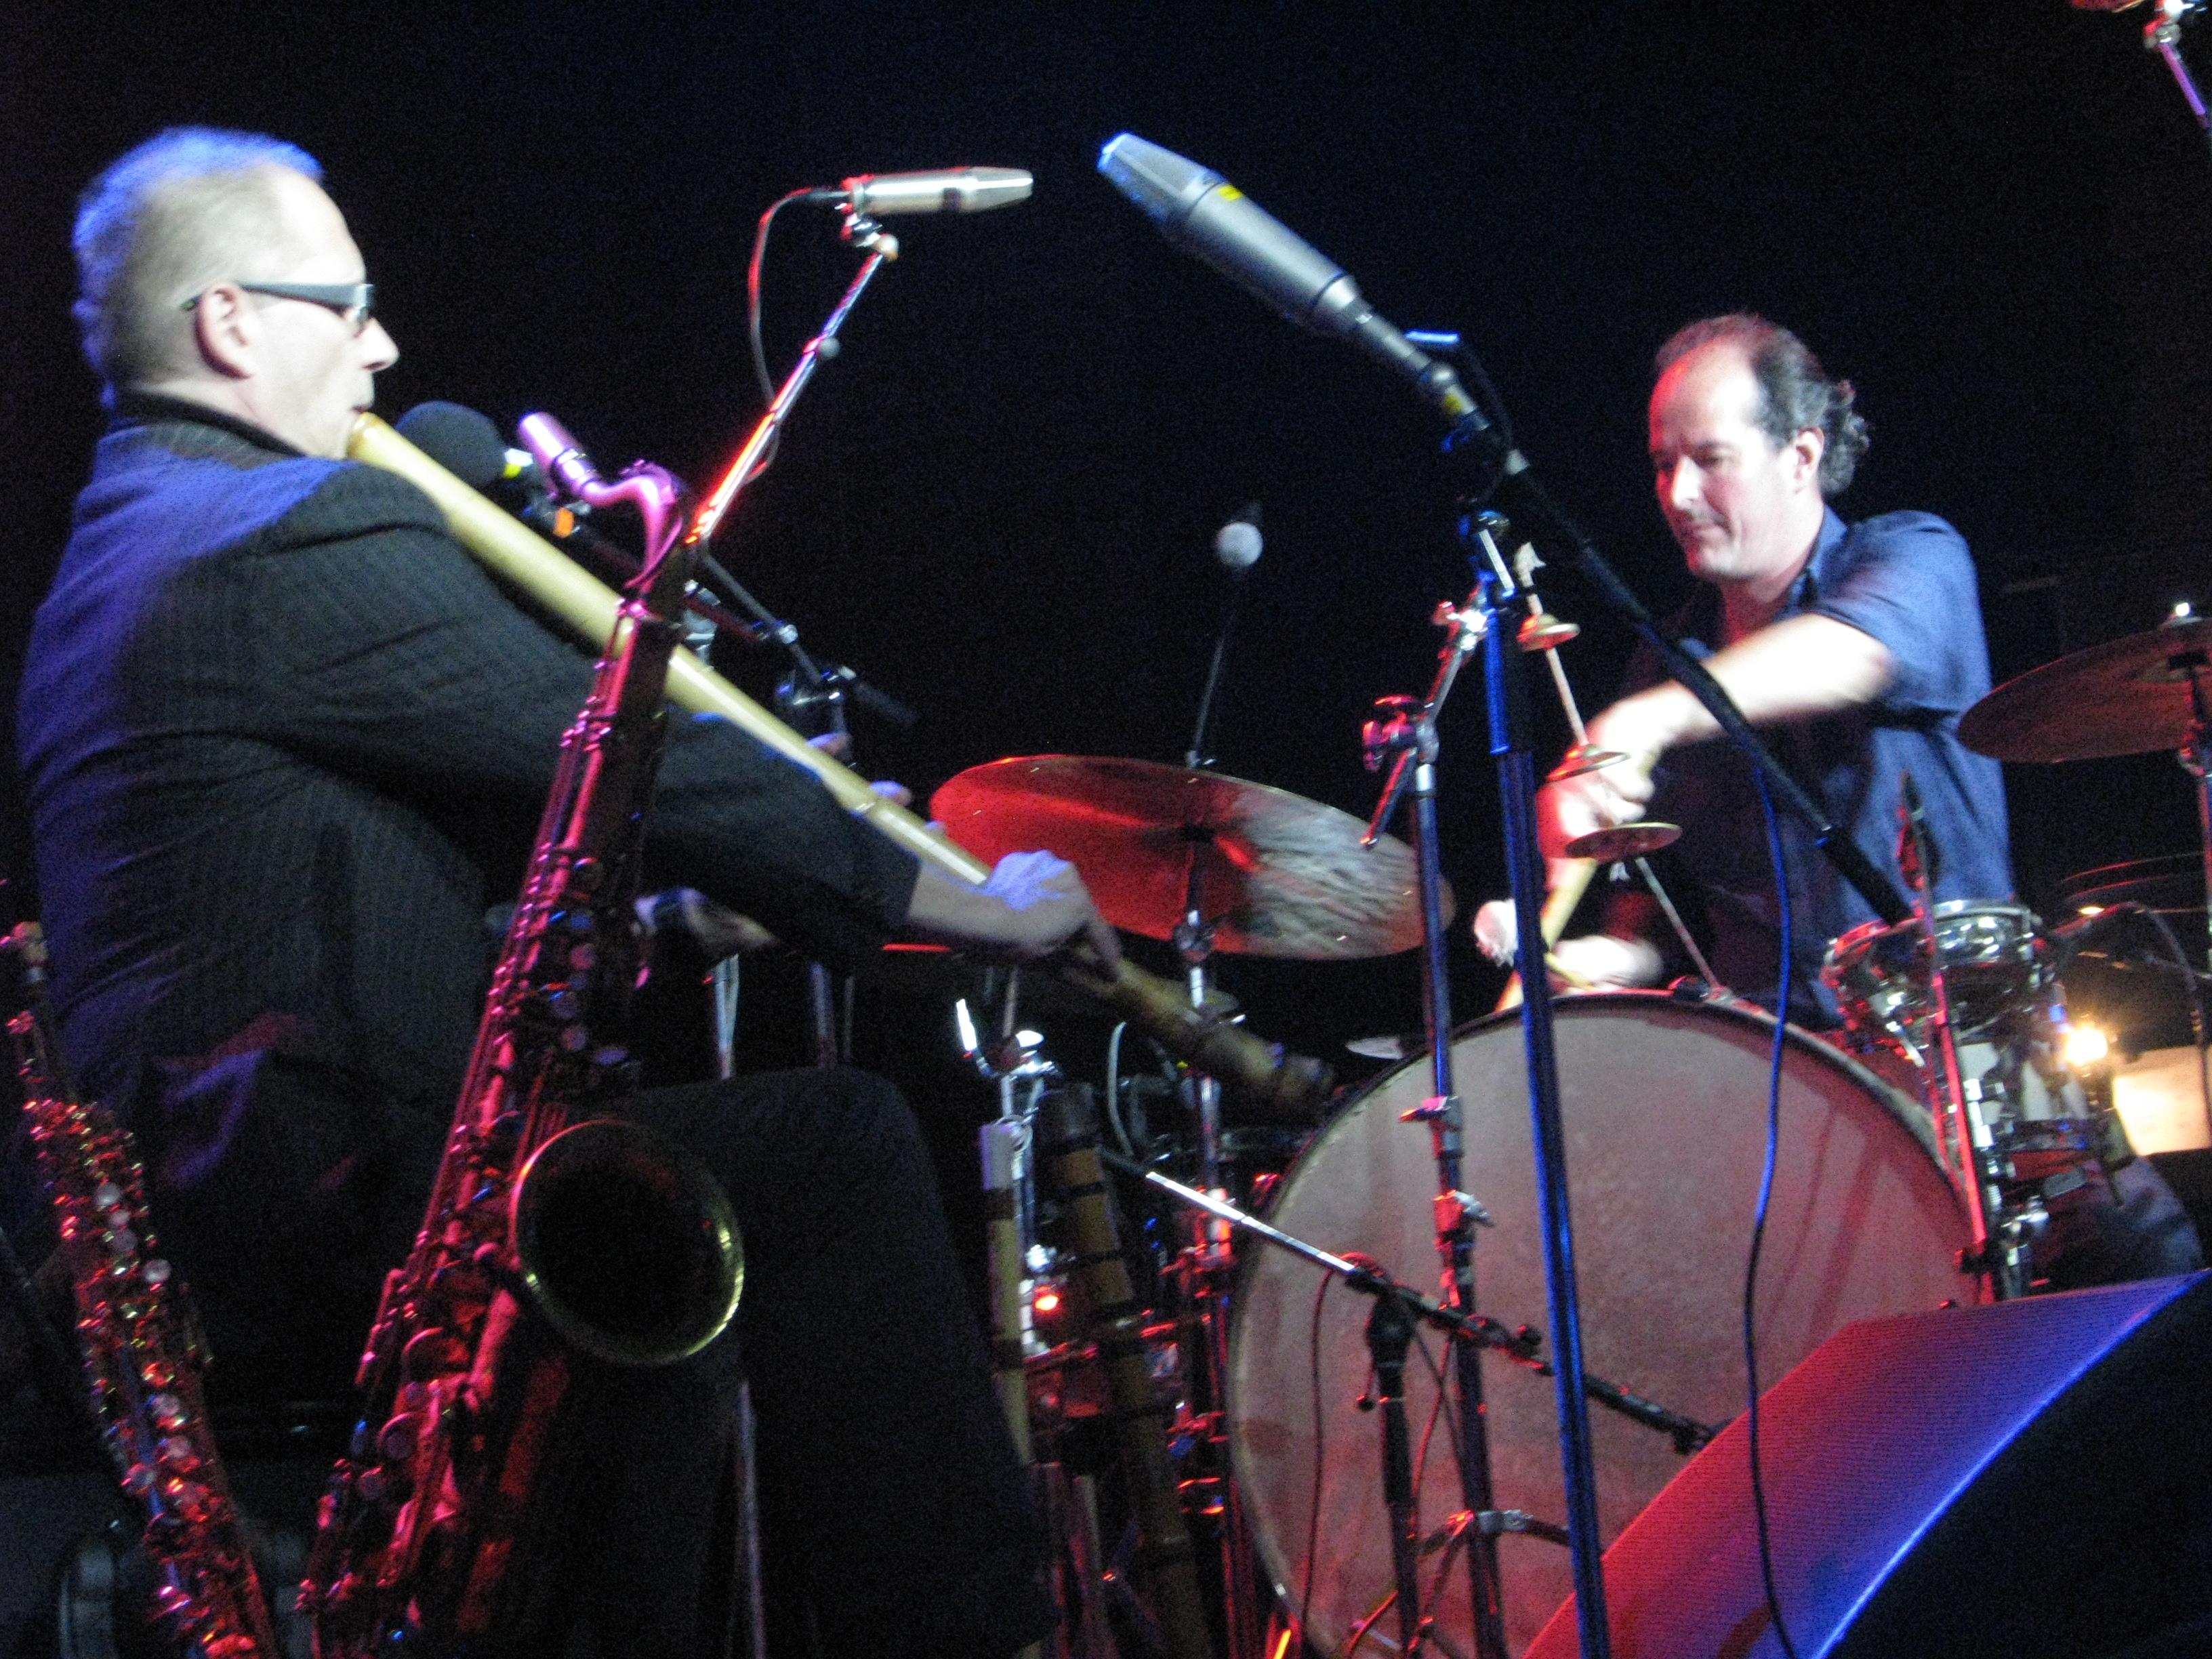 Markku Ounaskari, Jone Takamäki Tampere Jazz Happening 2014